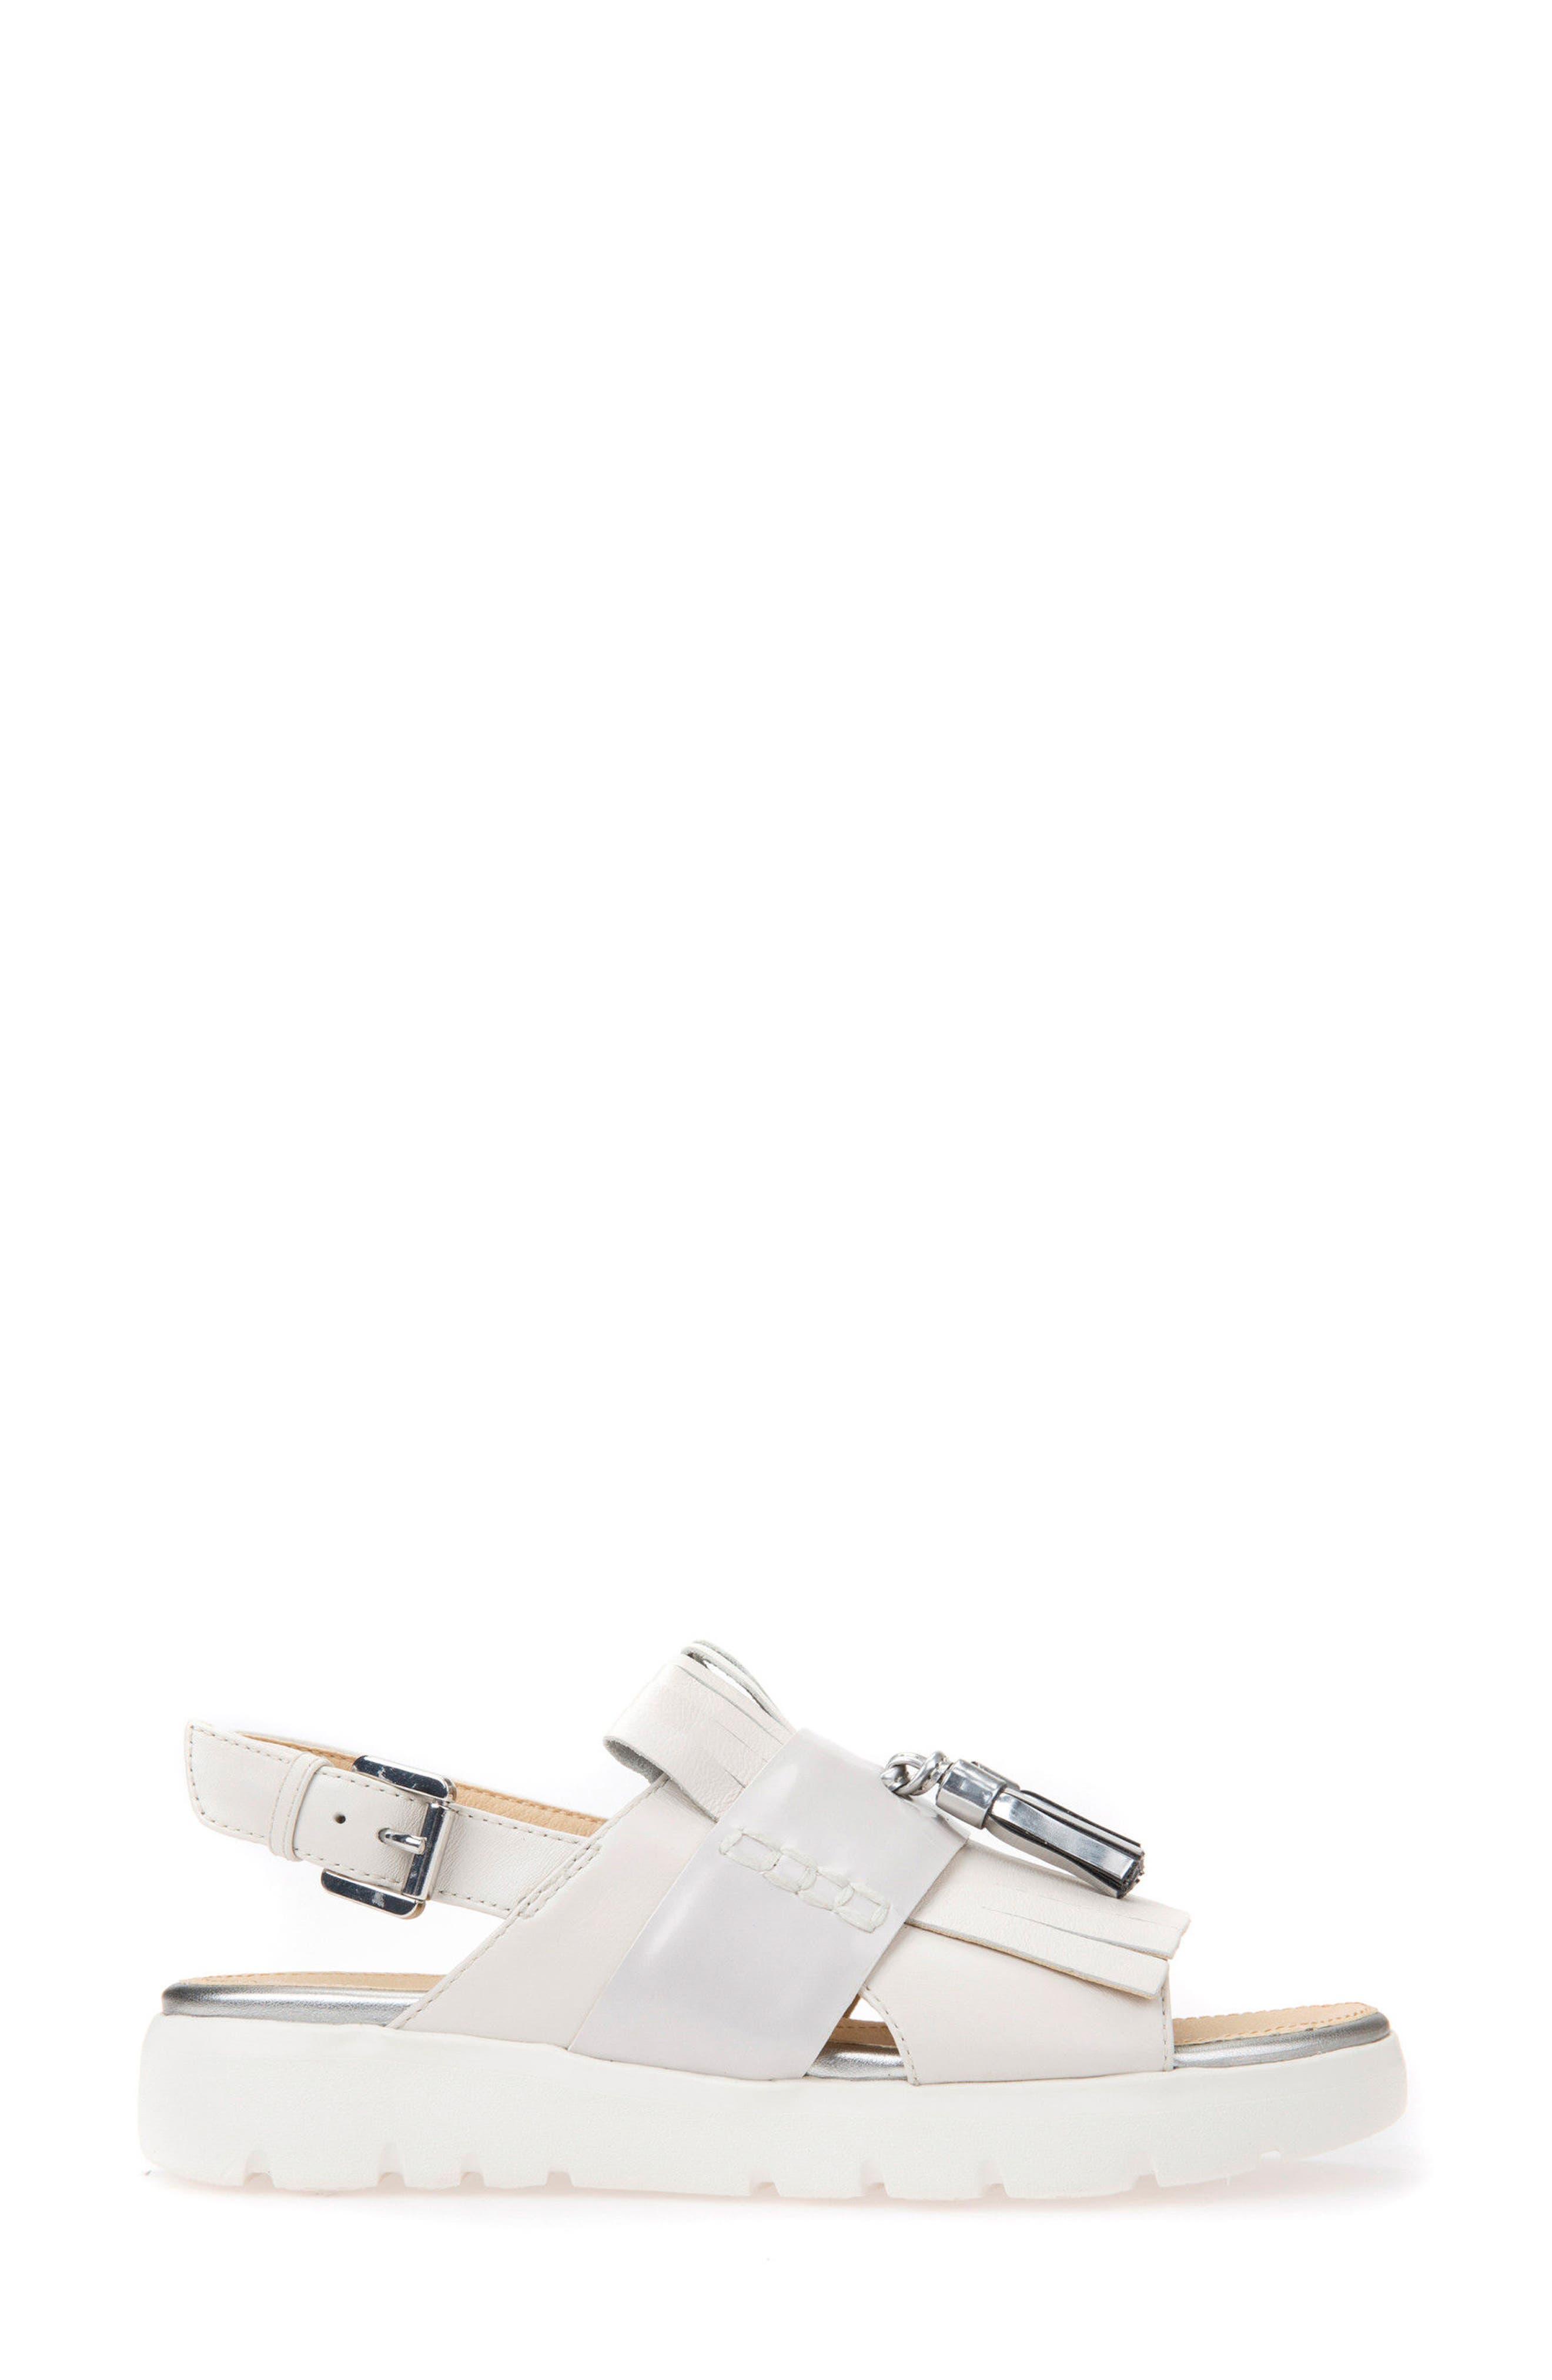 Amalitha Platform Sandal,                             Alternate thumbnail 3, color,                             OFF WHITE LEATHER